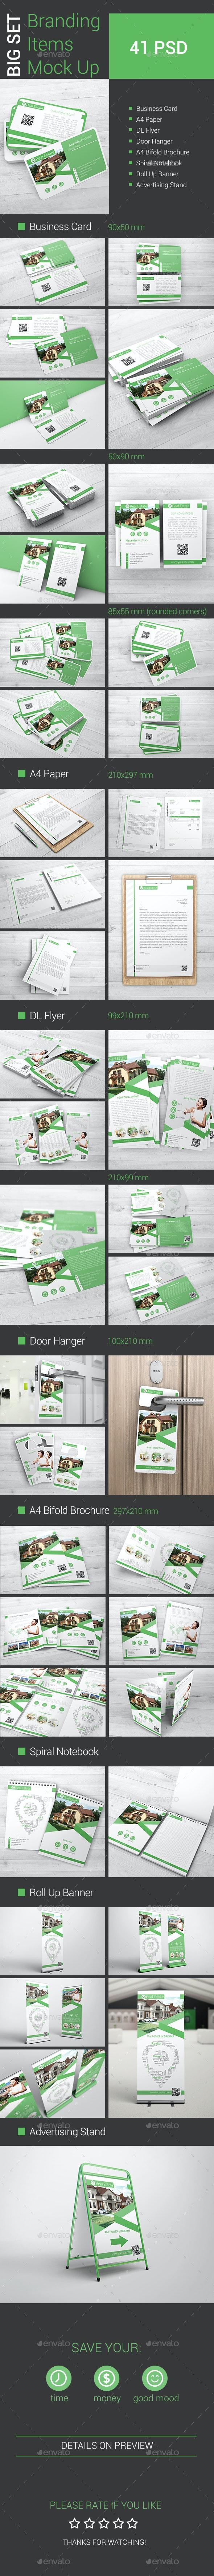 Branding Items Mock-Up - Print Product Mock-Ups